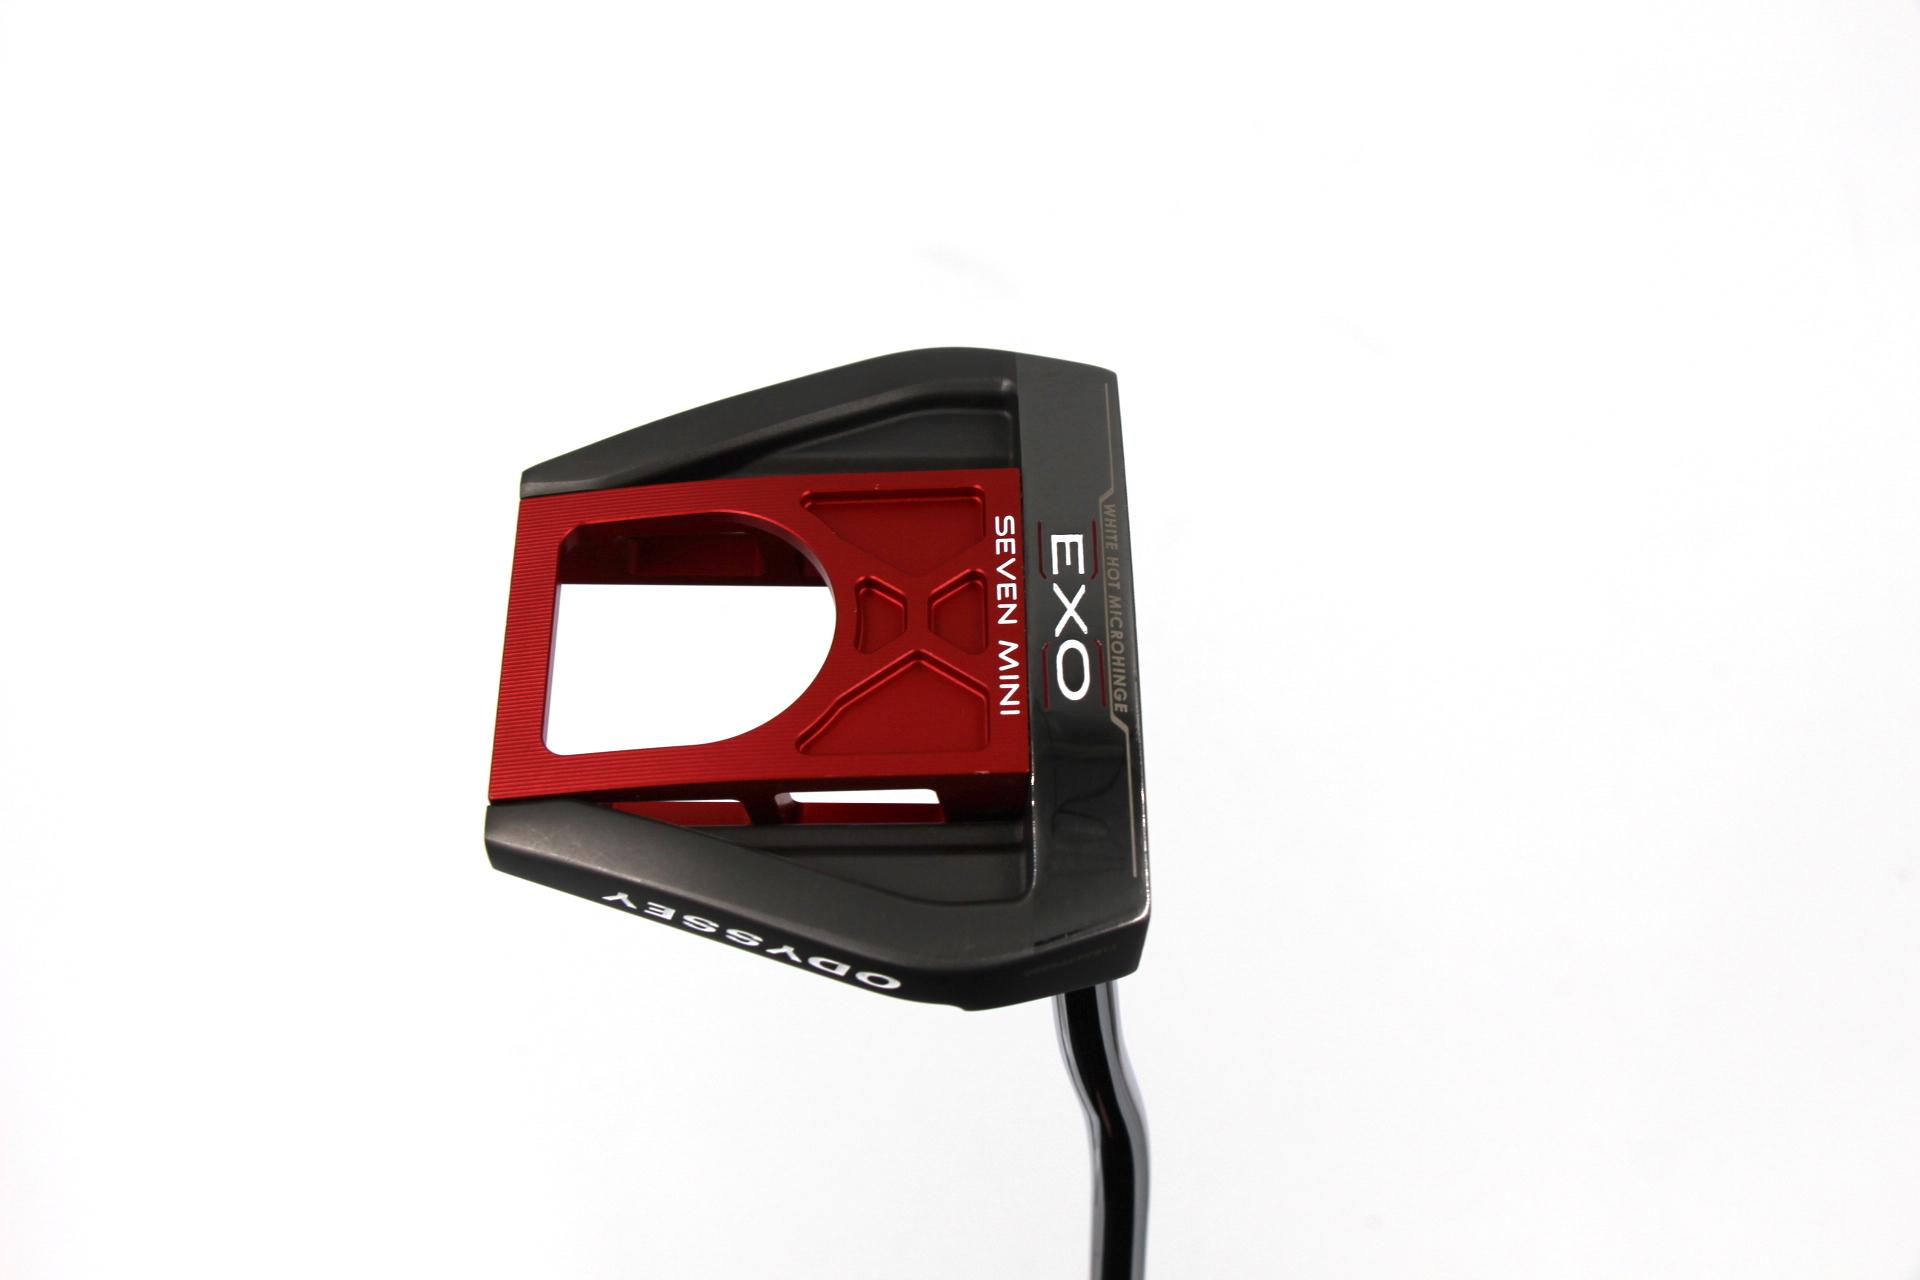 Odyssey Exo Stroke Lab Seven Mini Putter